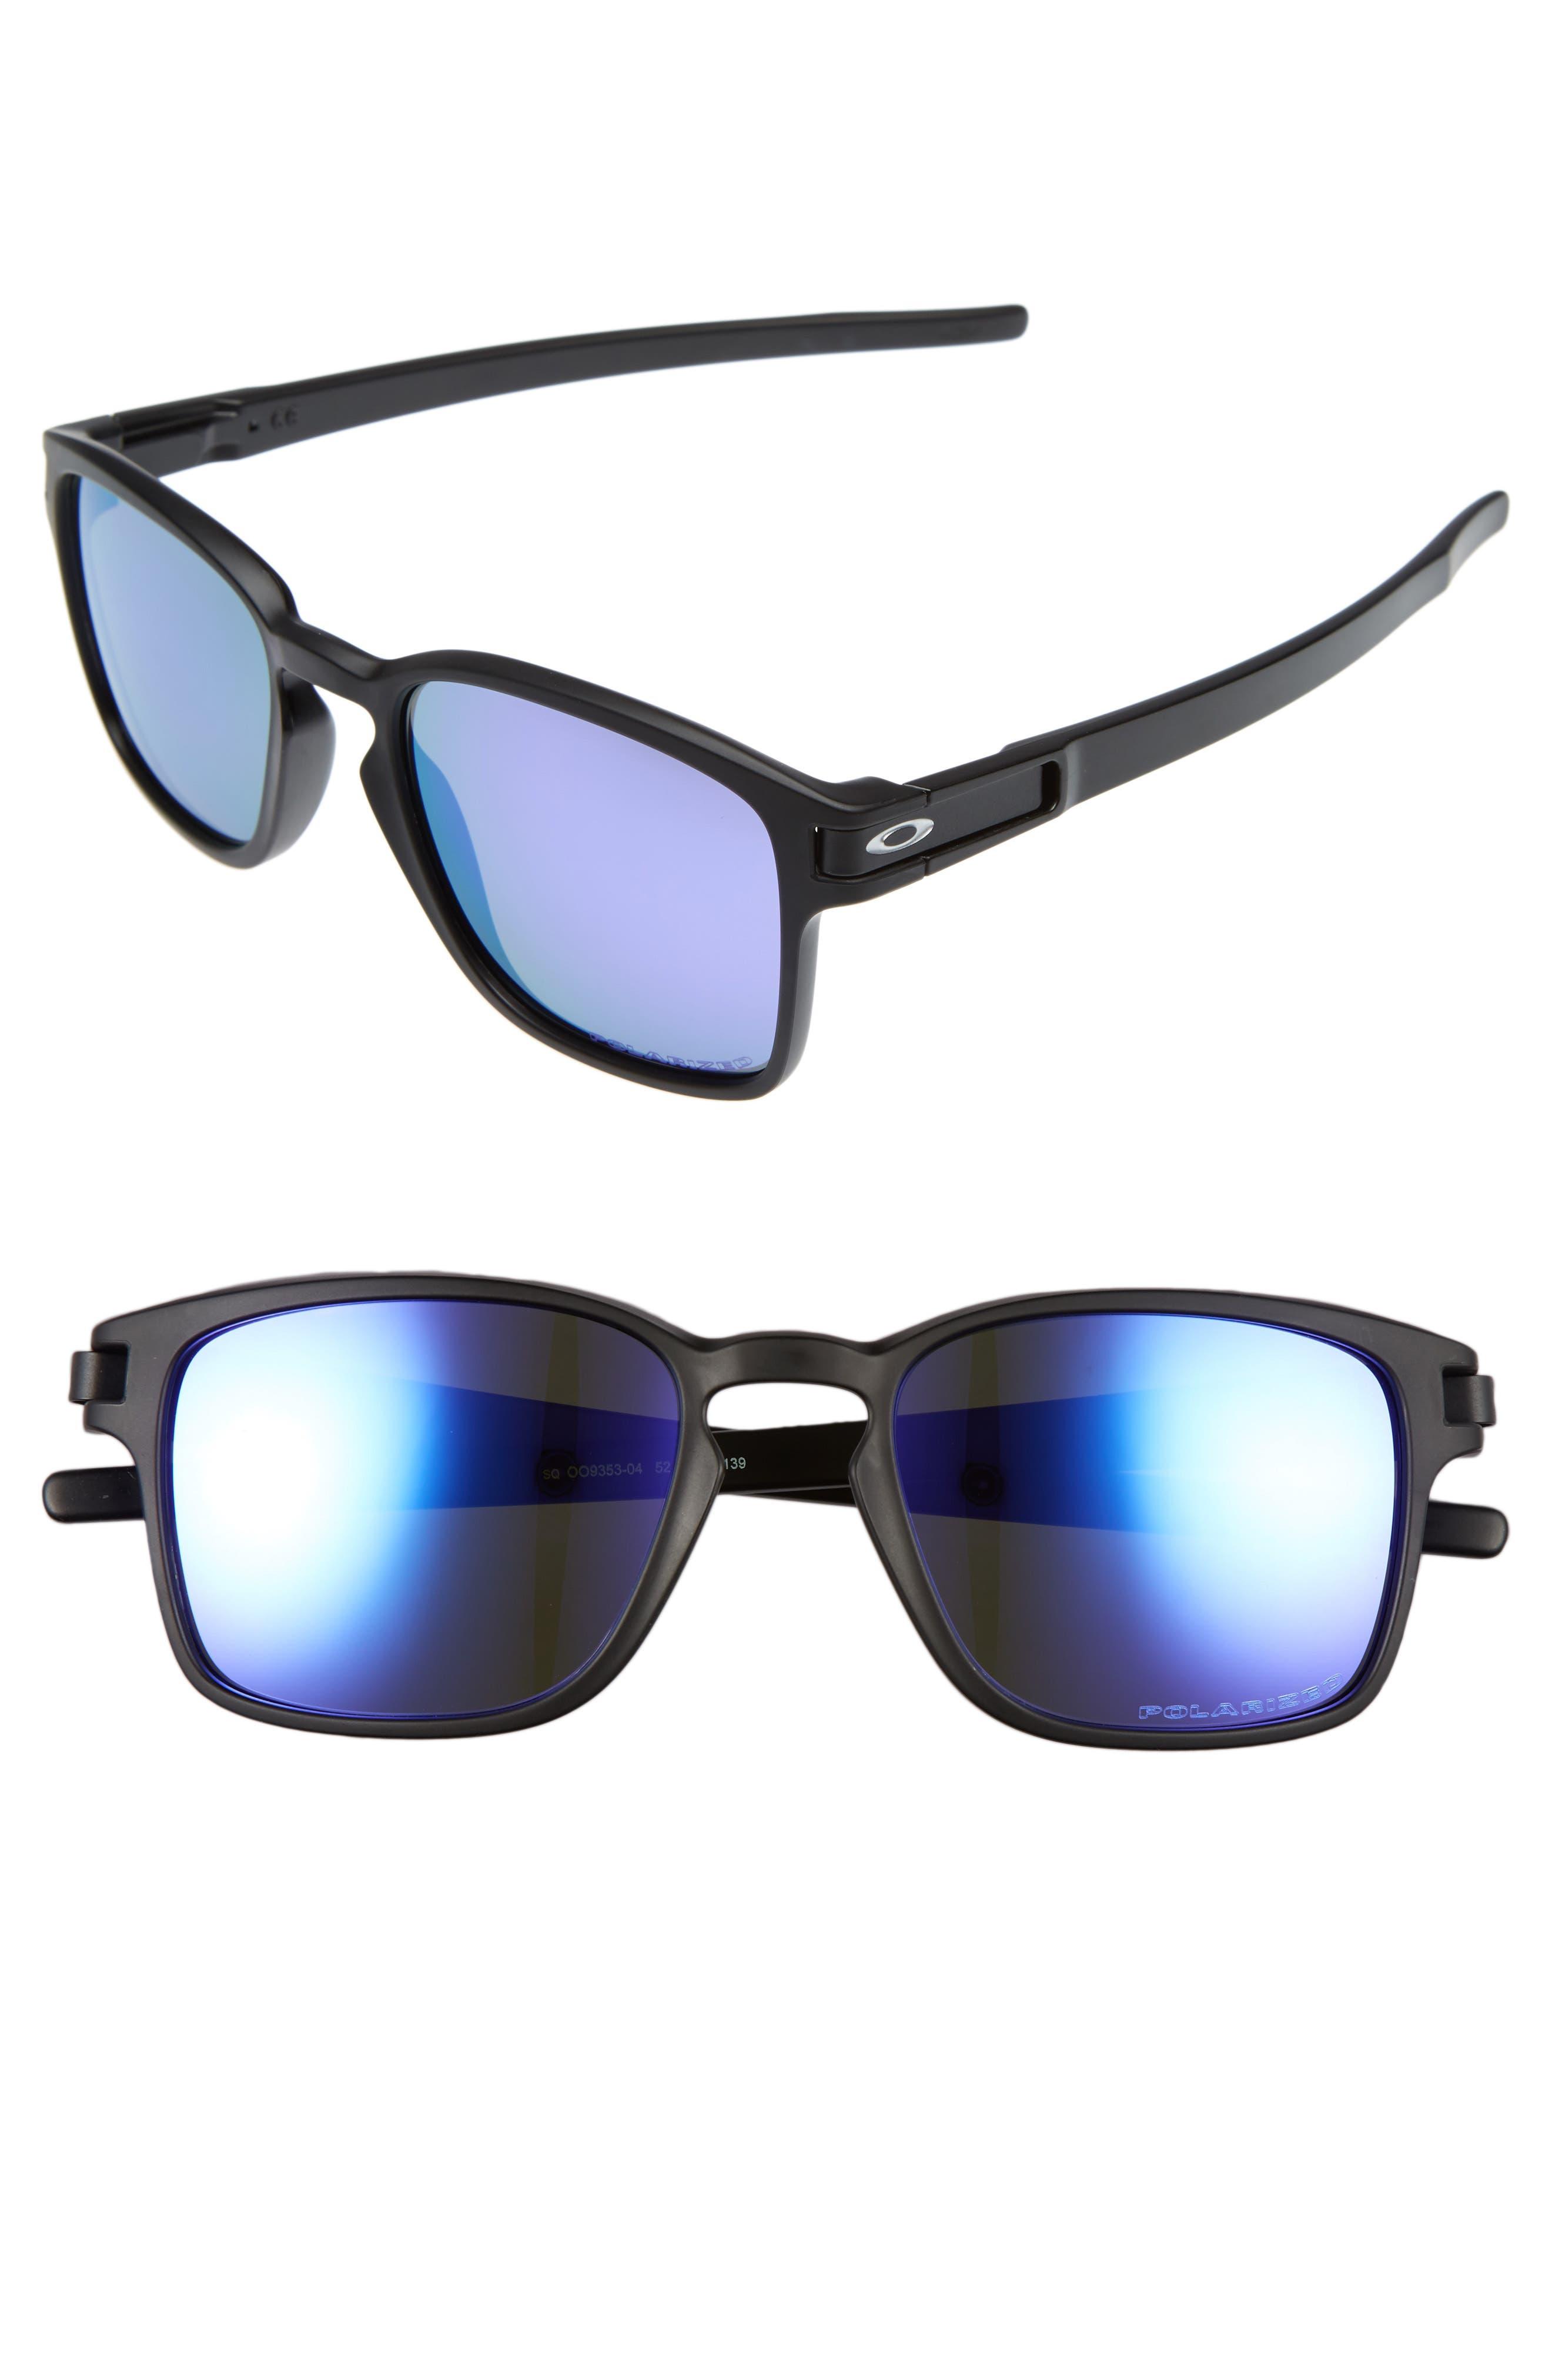 Main Image - Oakley Latch 52mm Polarized Rectangular Sunglasses